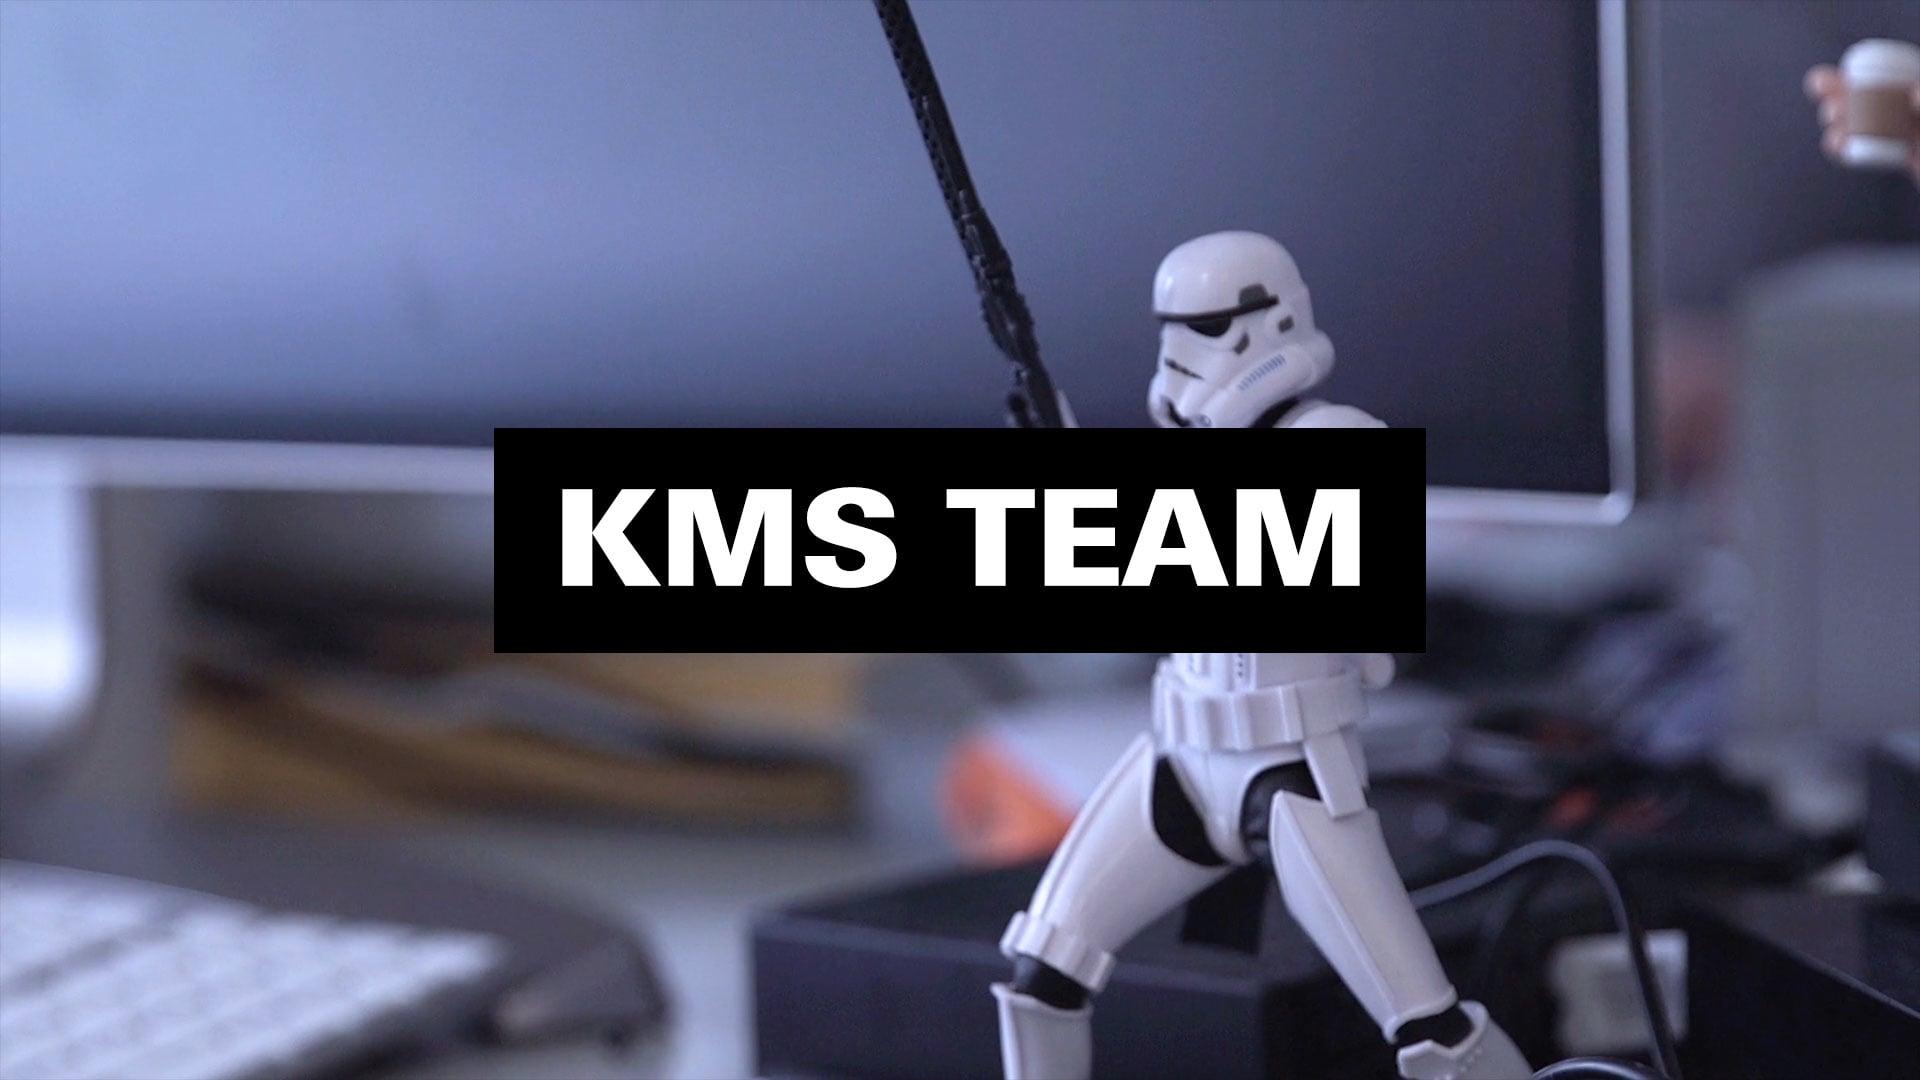 KMS - Employer Brand Film 2018 (MASTER)